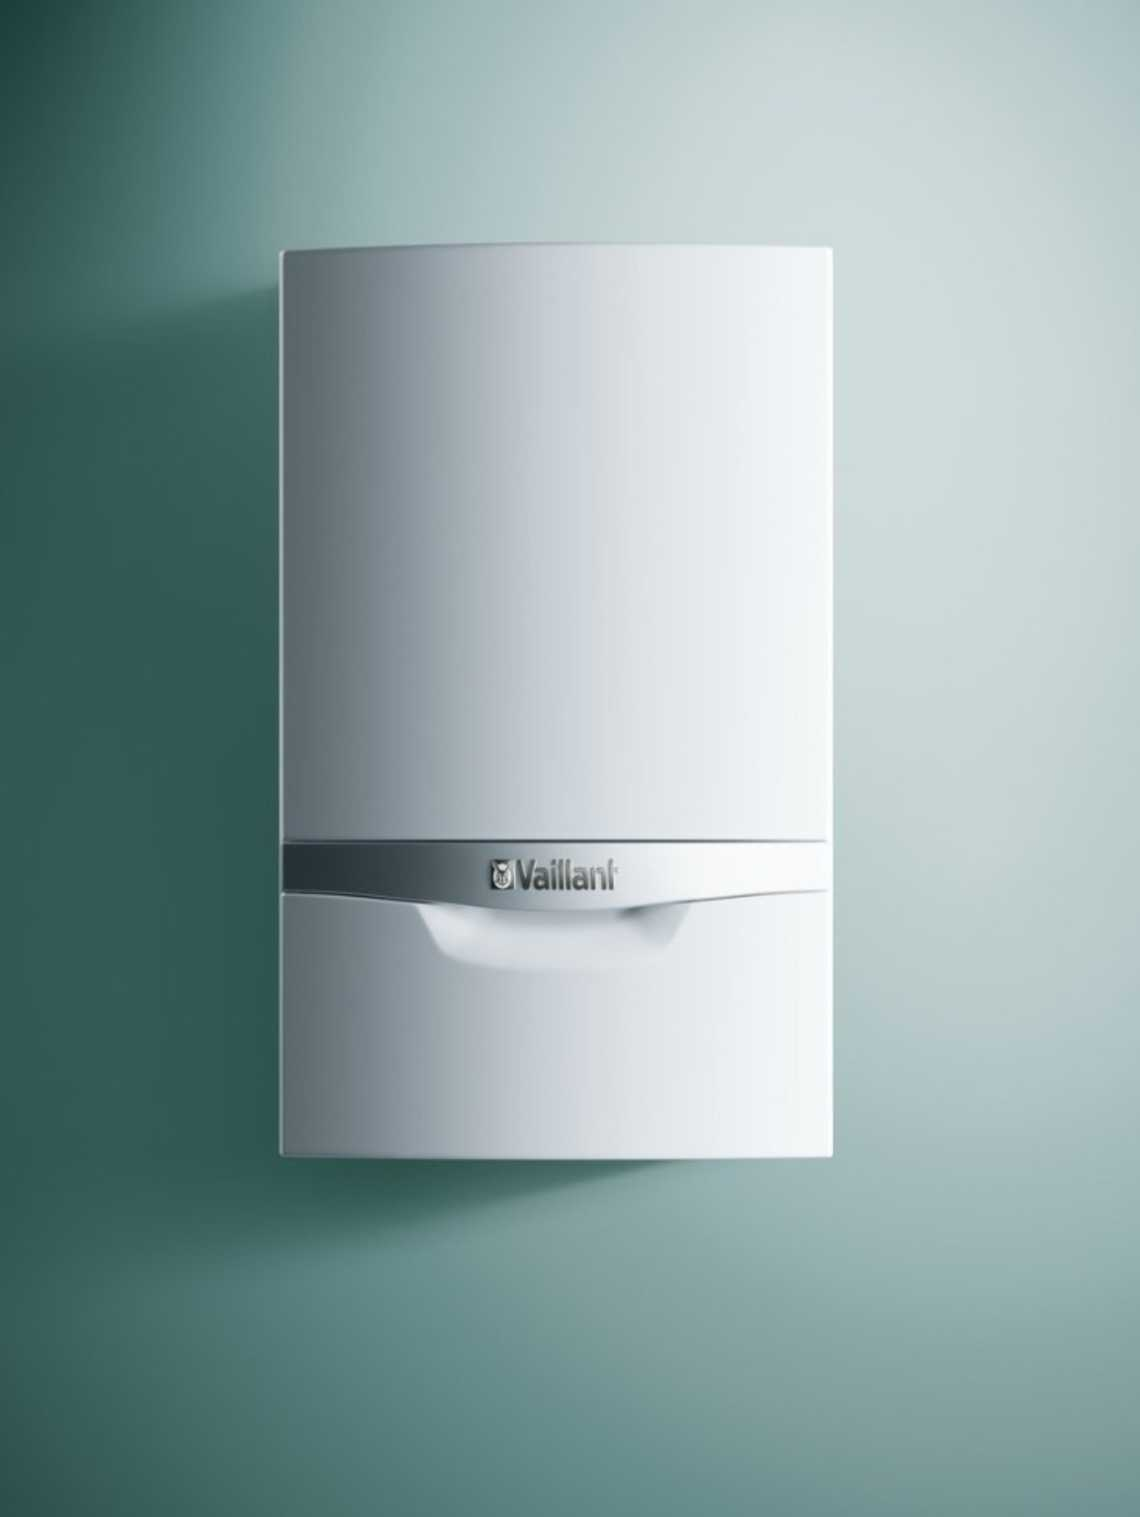 Vaillant ecoTEC plus VHR 30-34 cw5